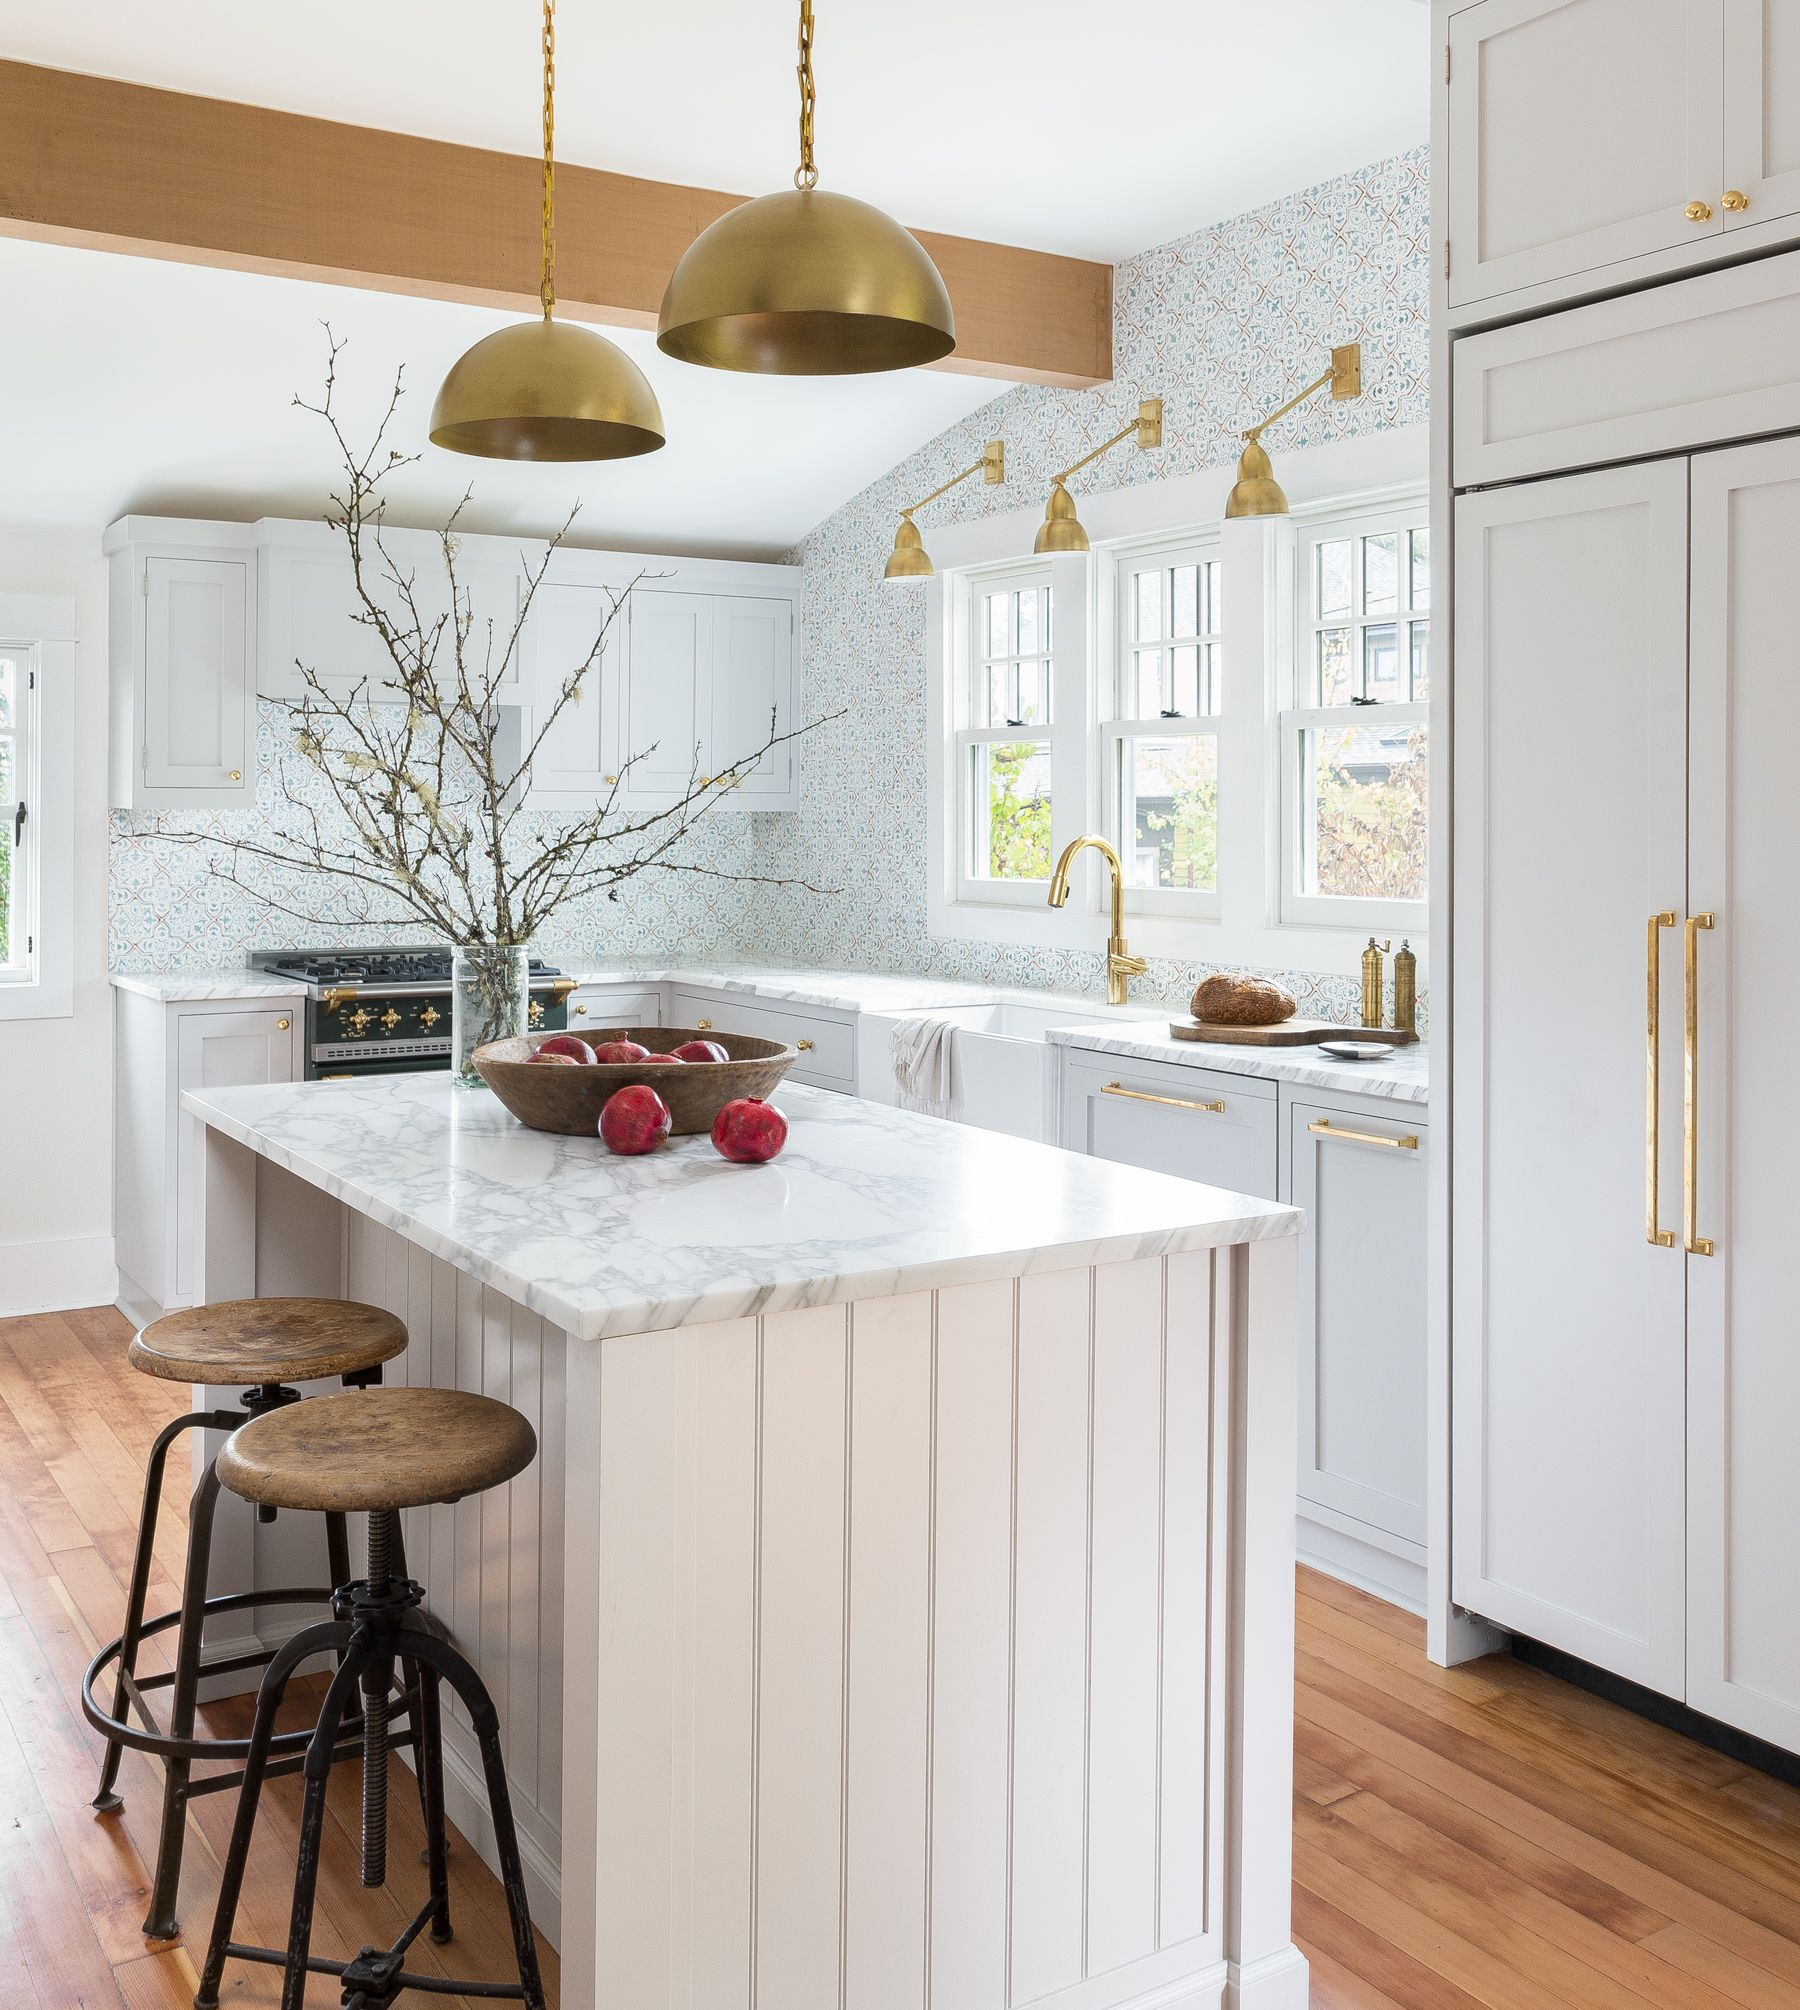 Juneau | Ceramic tile backsplash, Kitchens and Marble countertops